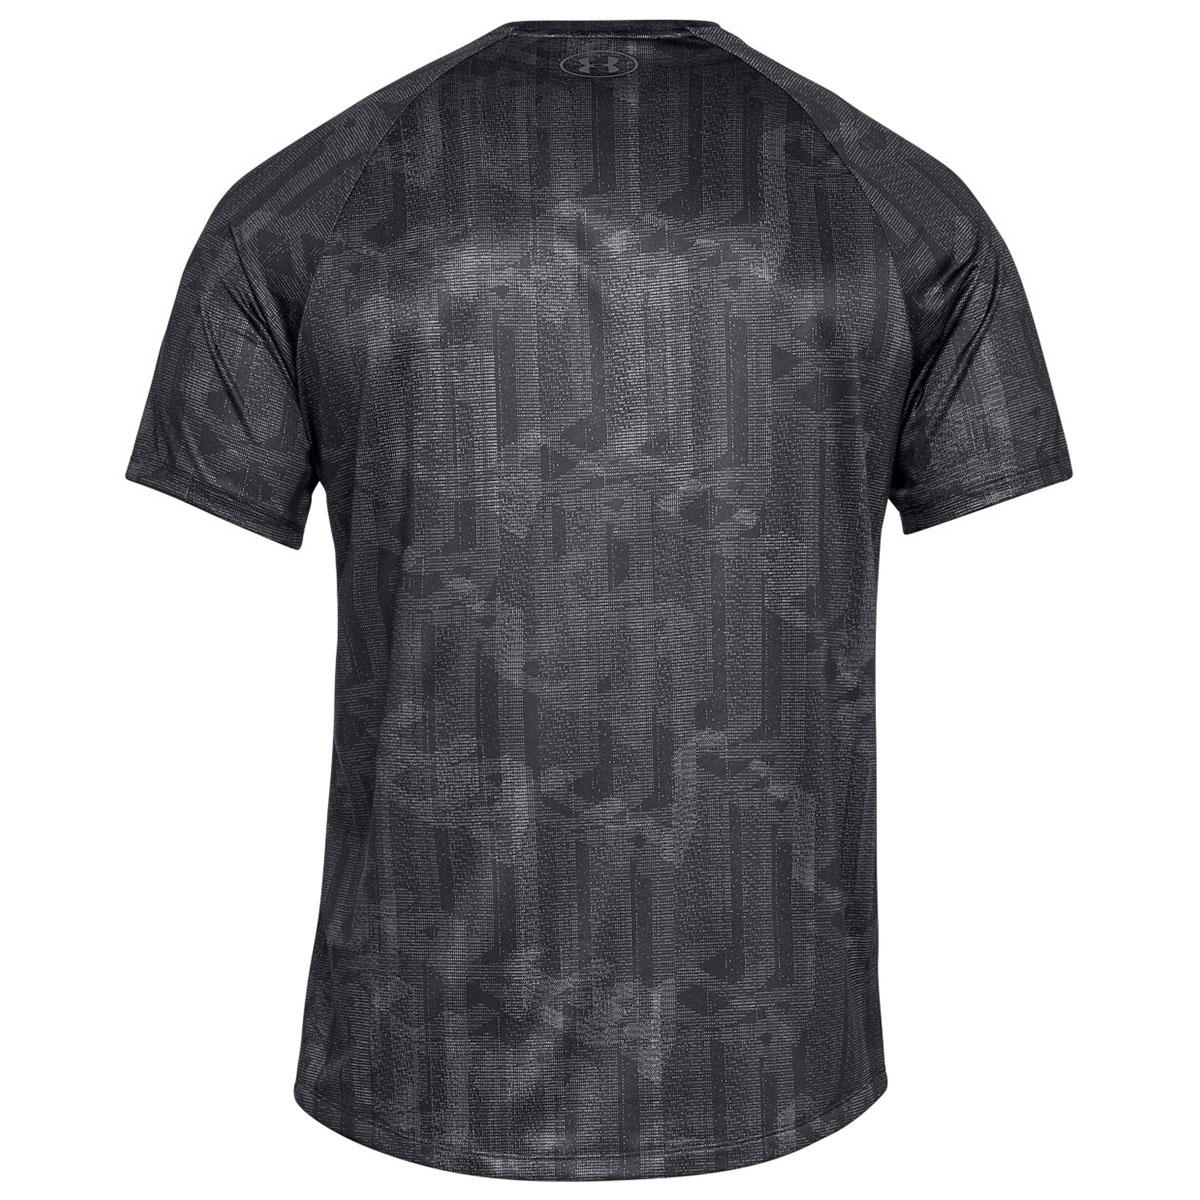 Under-Armour-Mens-UA-Tech-SS-Printed-Moisture-Wicking-T-Shirt-Tee-27-OFF-RRP thumbnail 5